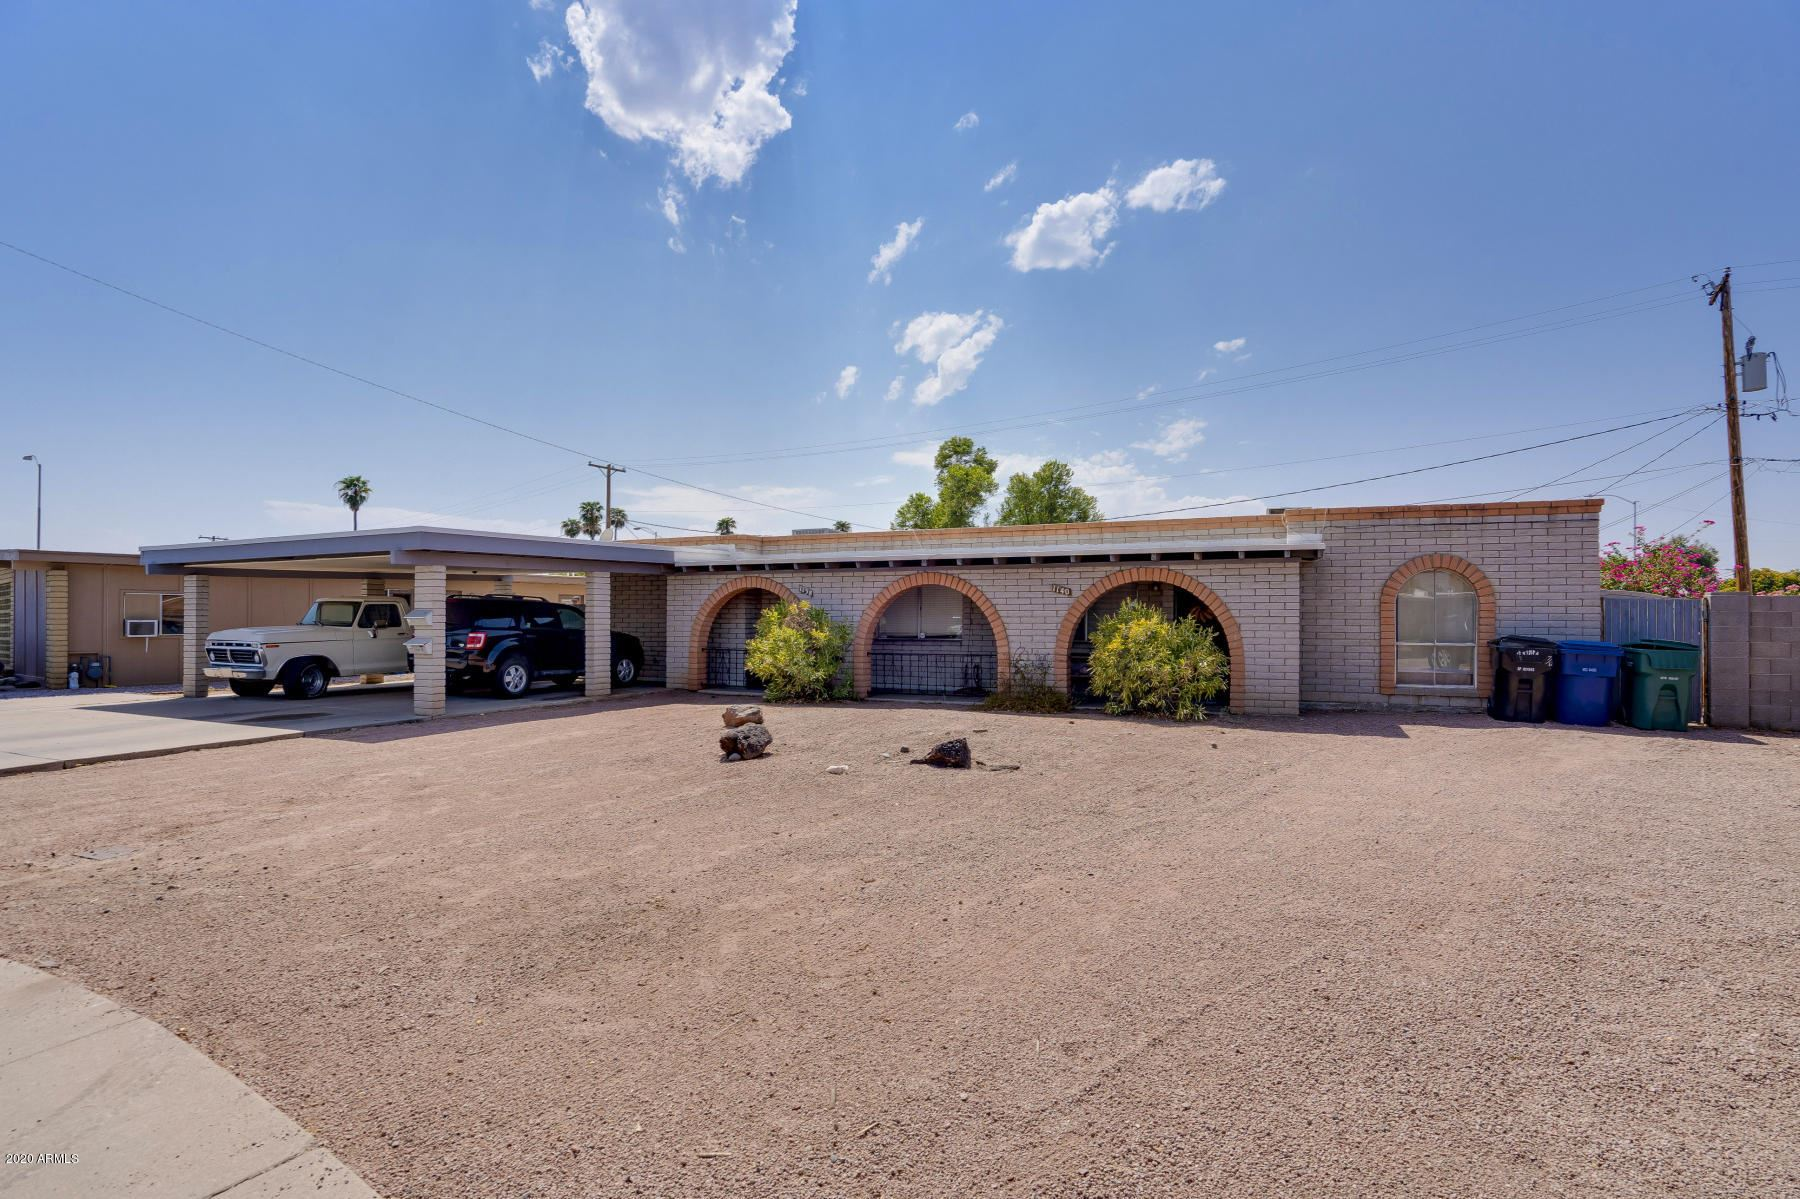 1138 N WEDGEWOOD Circle, Mesa, AZ 85203 - MLS#: 6123143